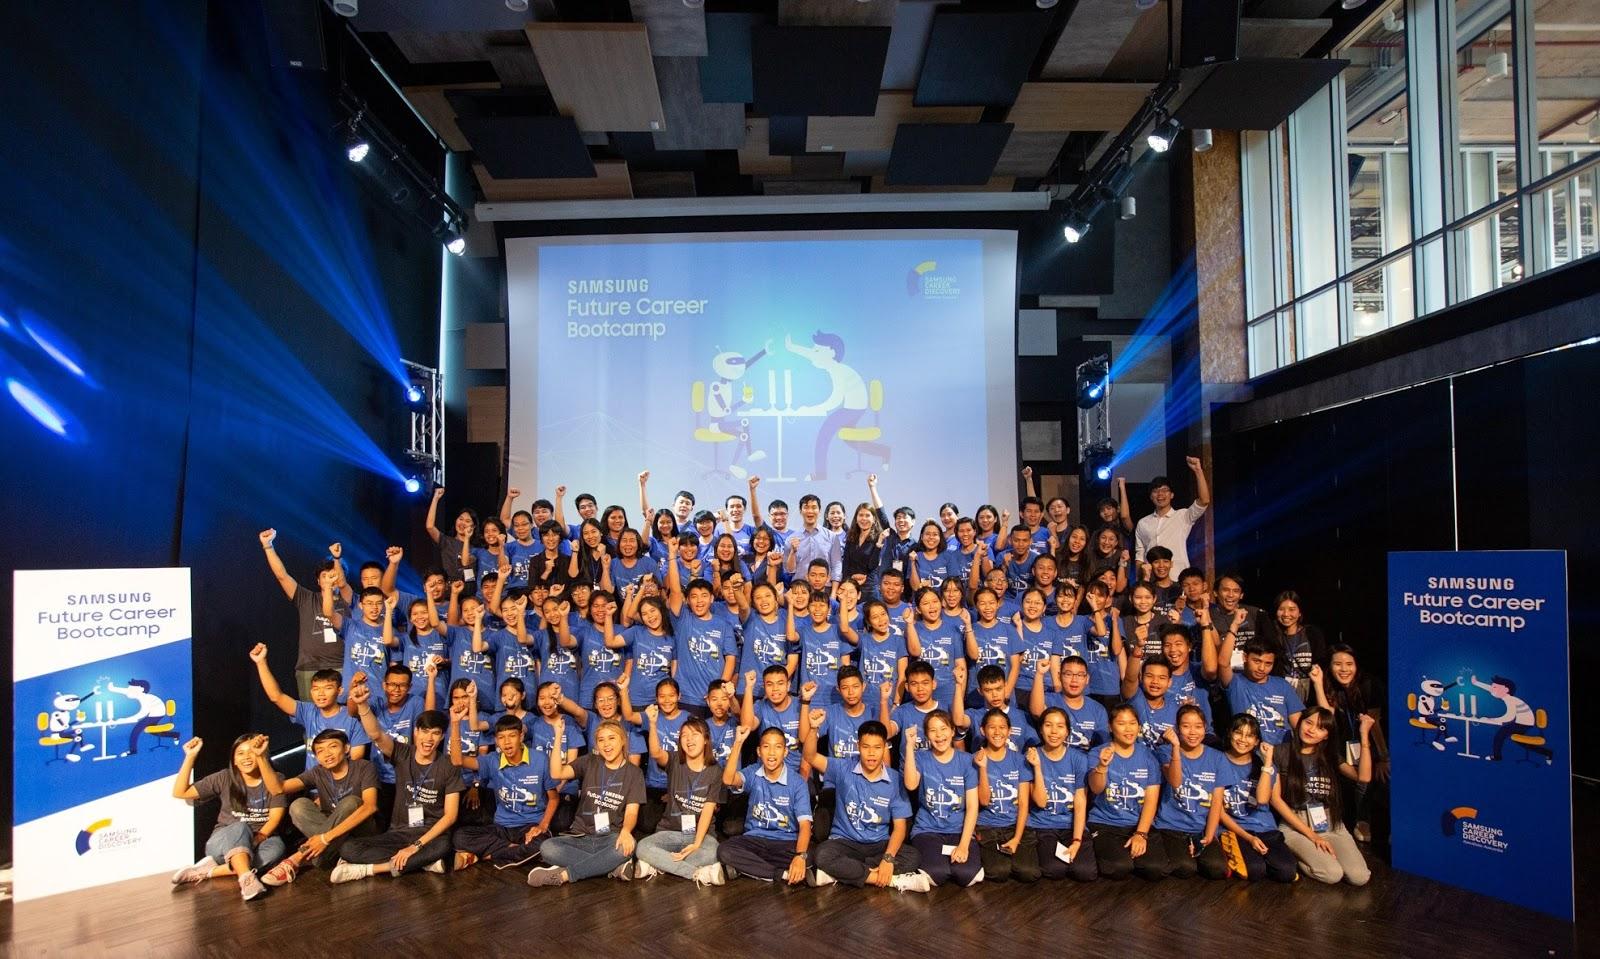 Samsung จัดค่าย Future Career Bootcamp  หนุนเด็กมัธยมพัฒนาทักษะ รับมือเทคโนโลยีเปลี่ยนโลก AI-Big Data-Automation